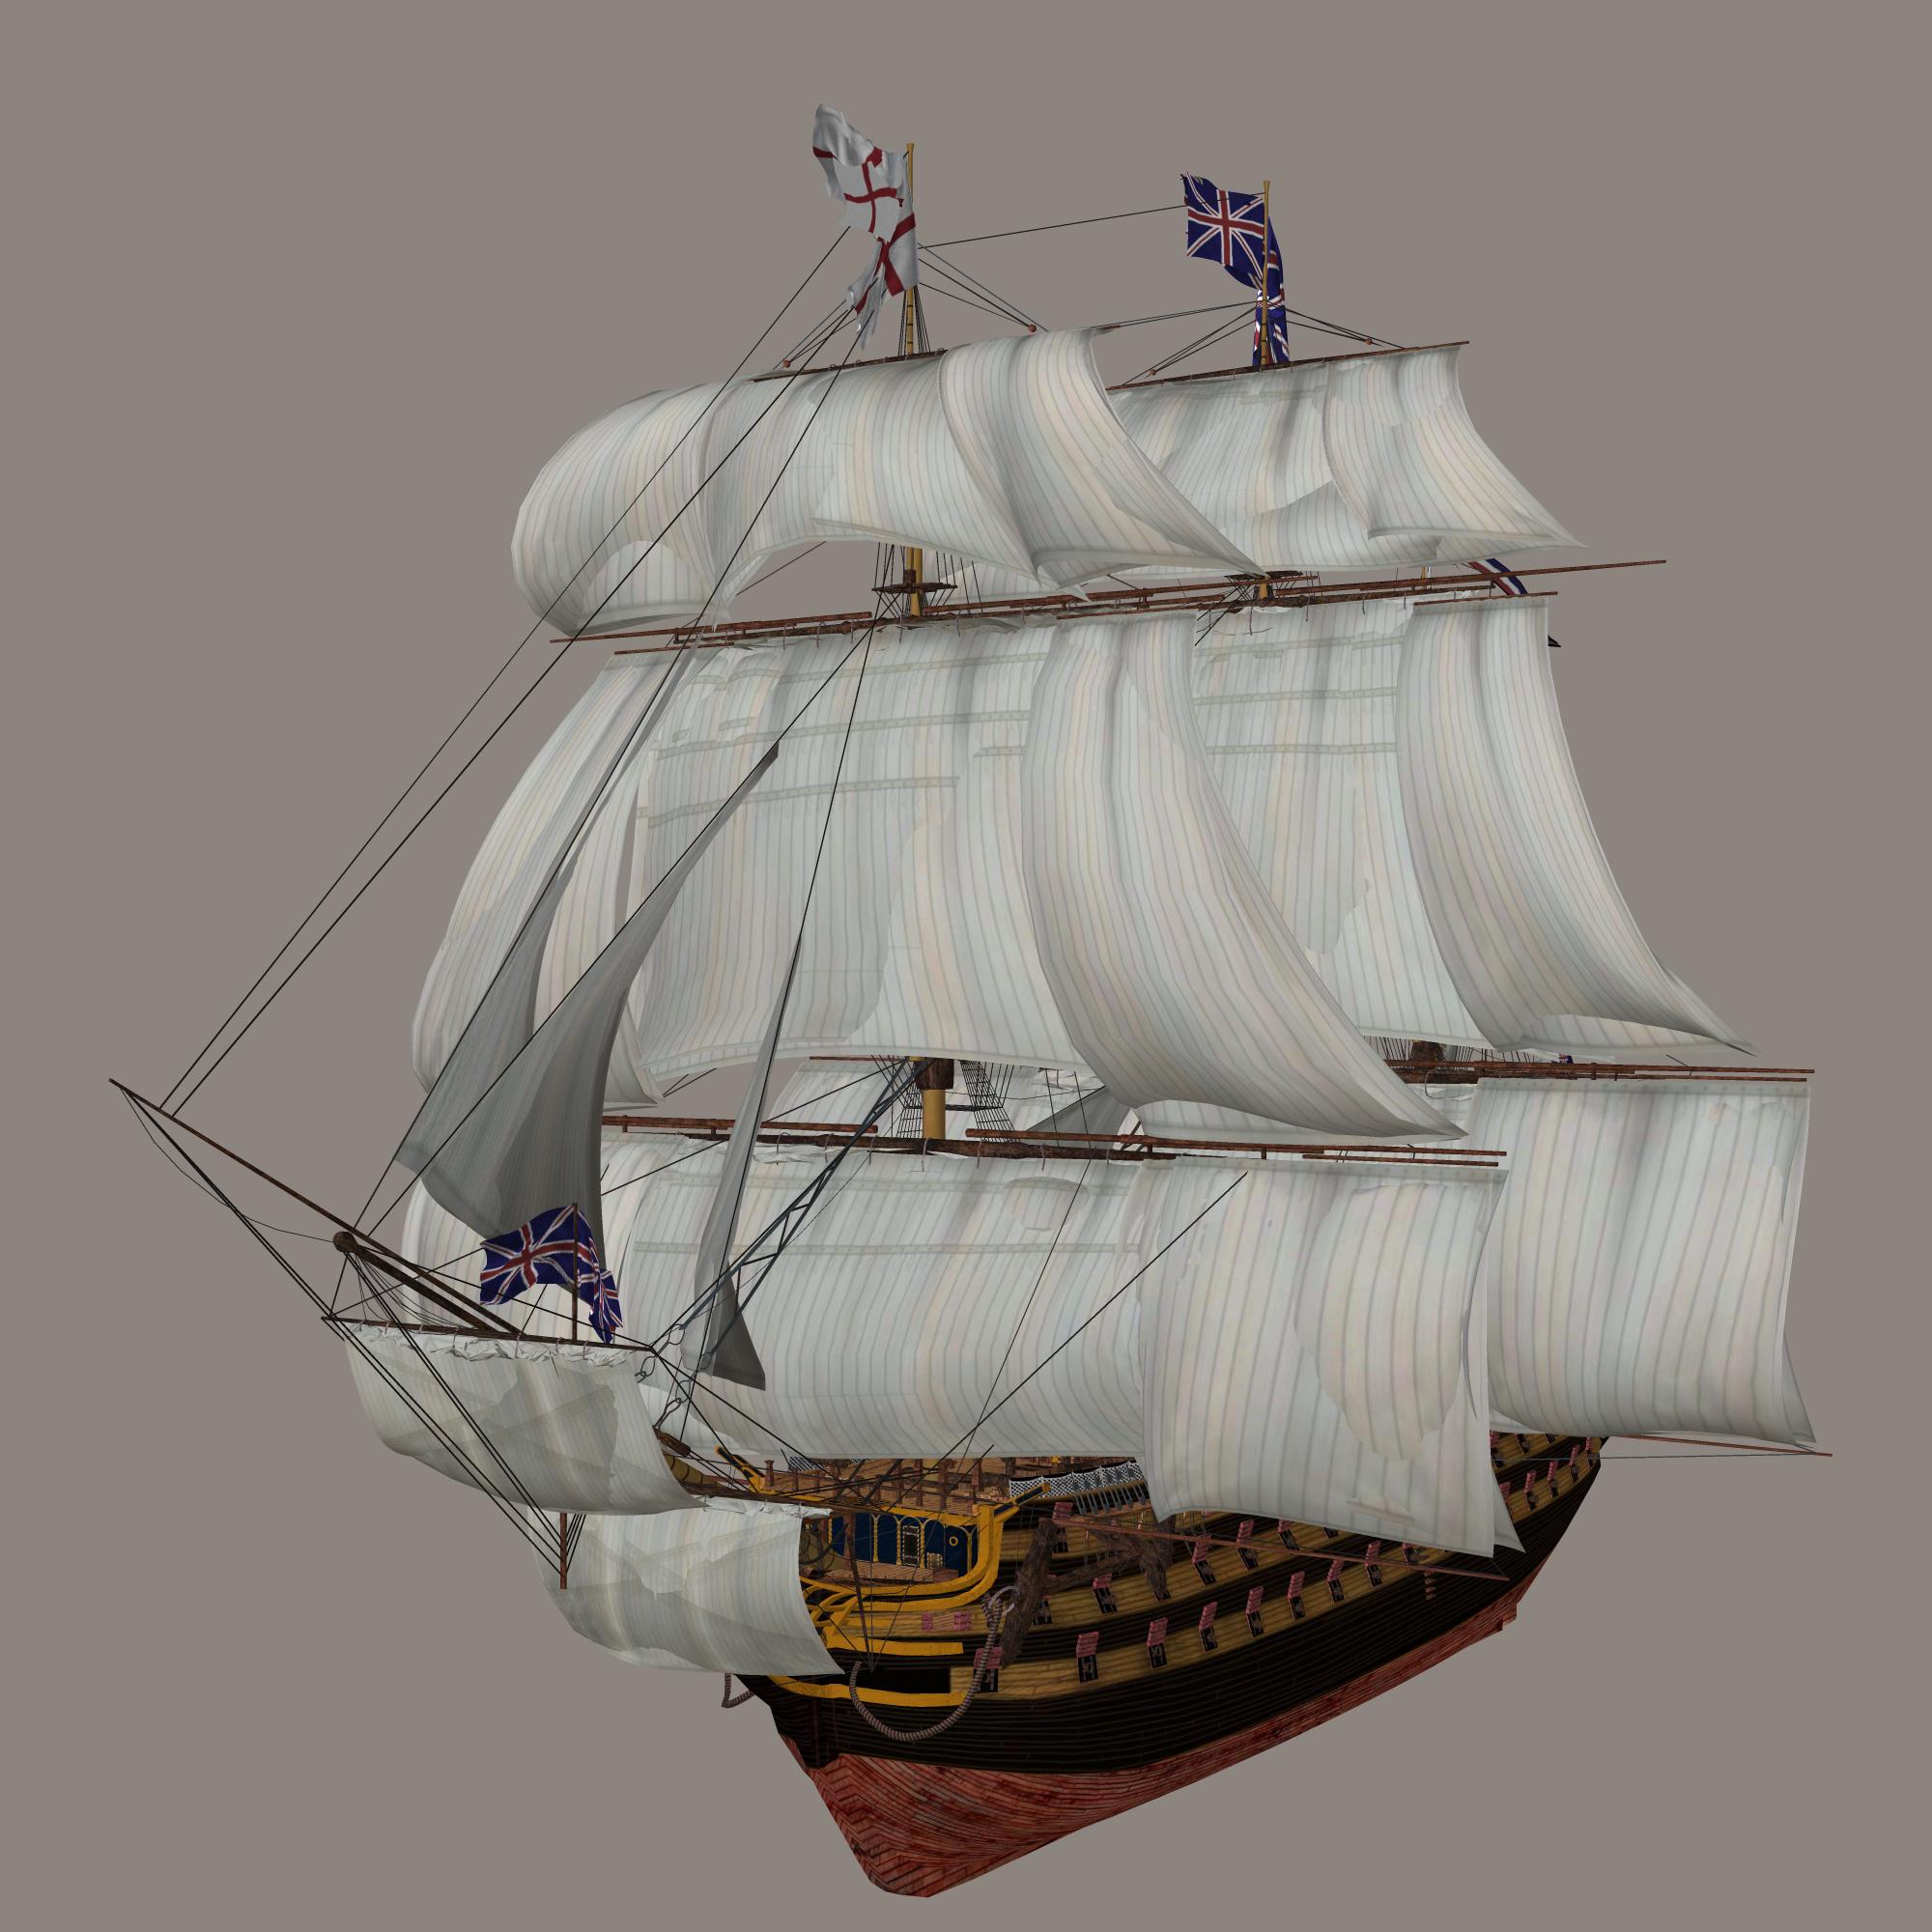 Sailing Ship clipart colonization #7